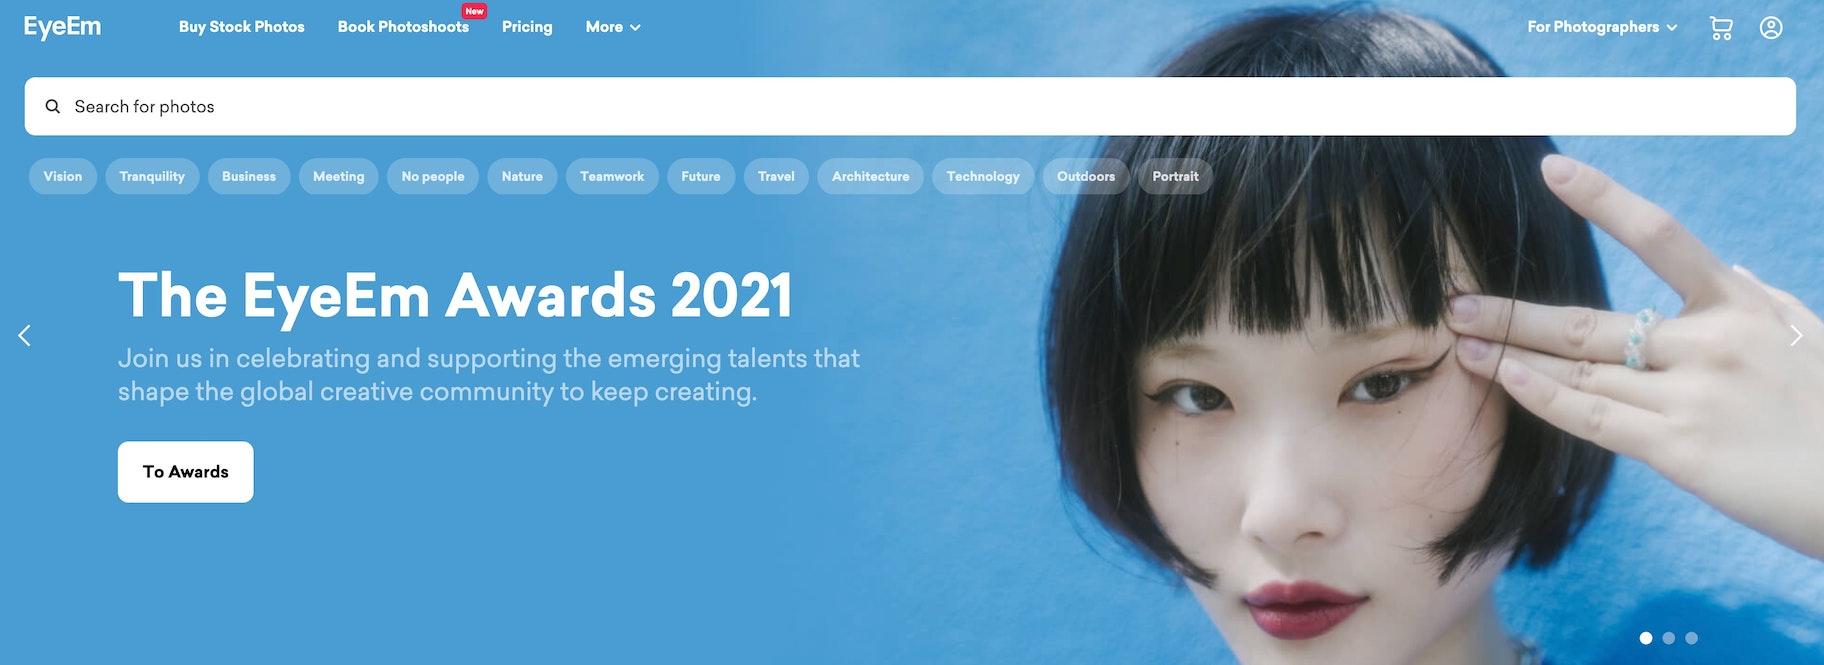 Premium Stock Image Websites - EyeEm